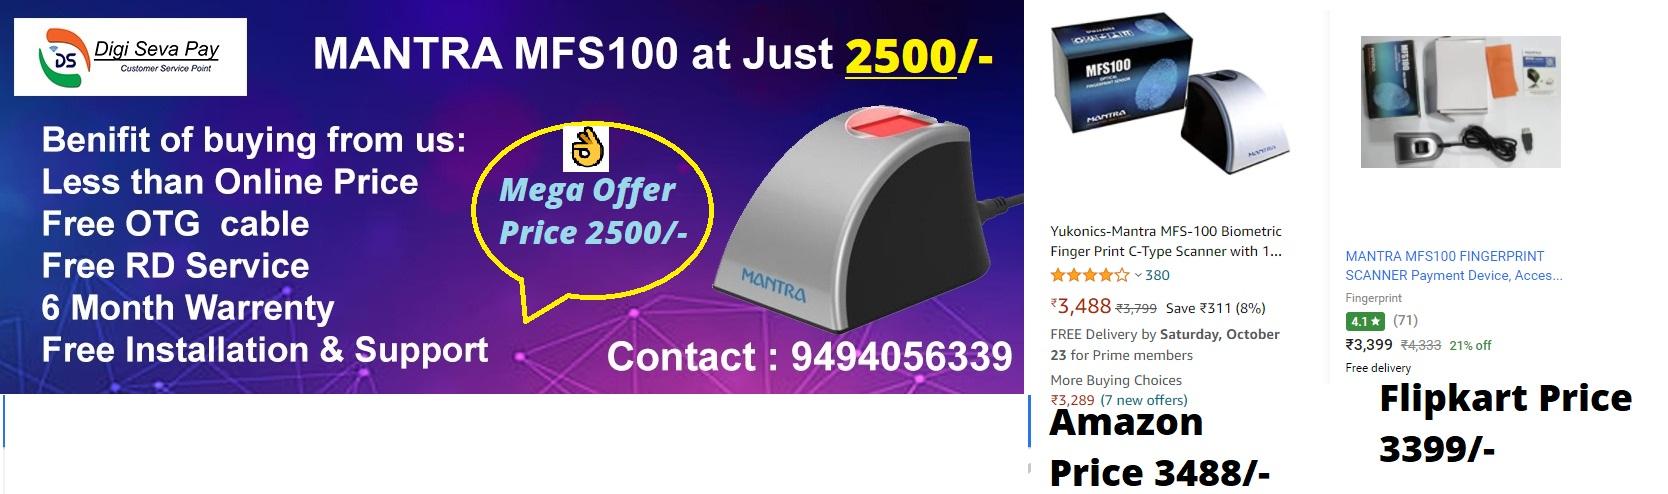 Mantra Biometric Offer Price